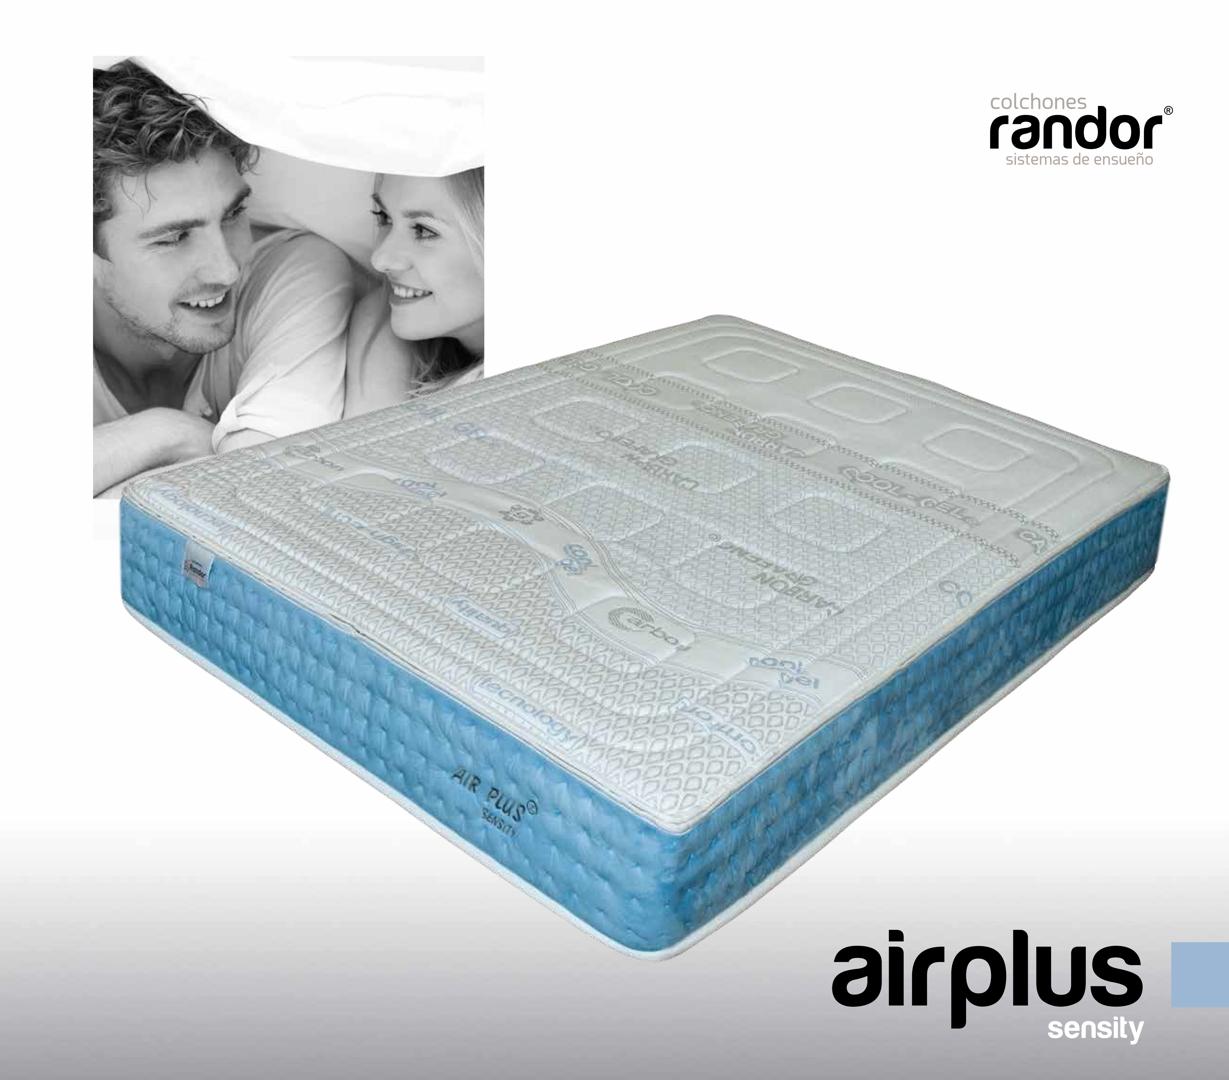 colchones randor flexibles airplus